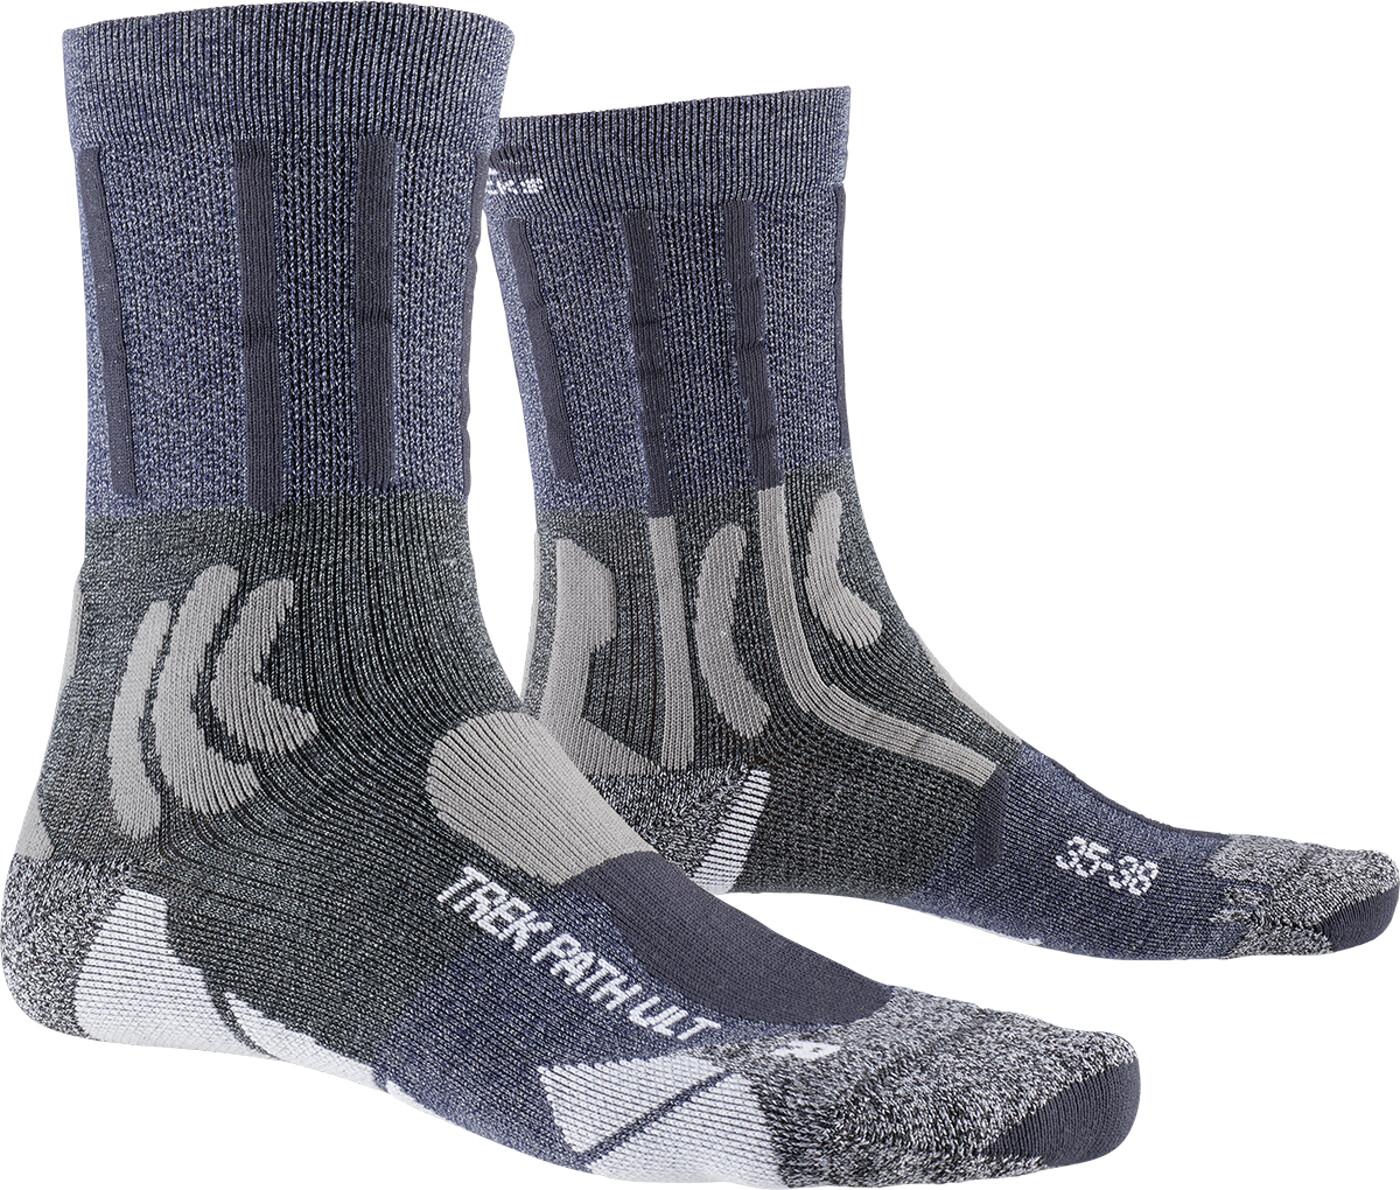 X-BIONIC TREK PATH ULTRA LIGHT Socken - Herren